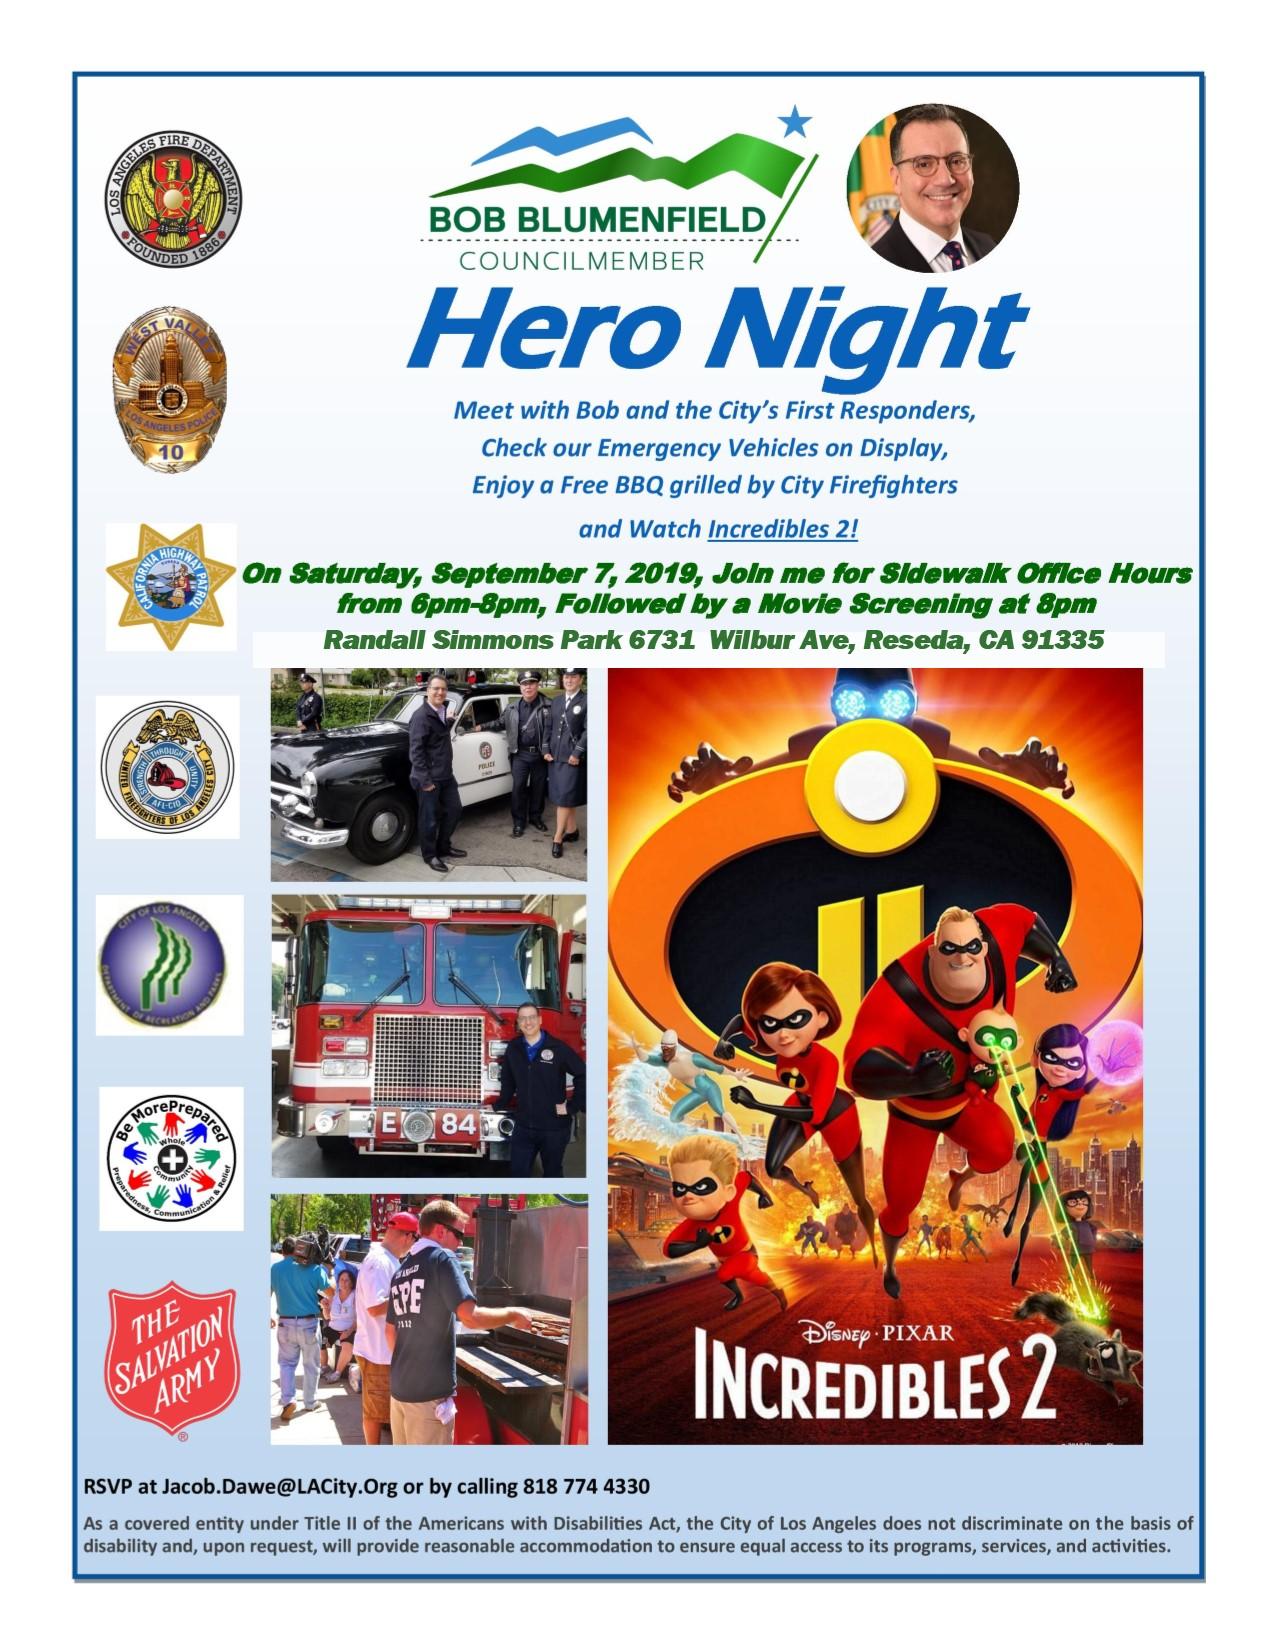 Blumenfield_Hero_Night.jpg